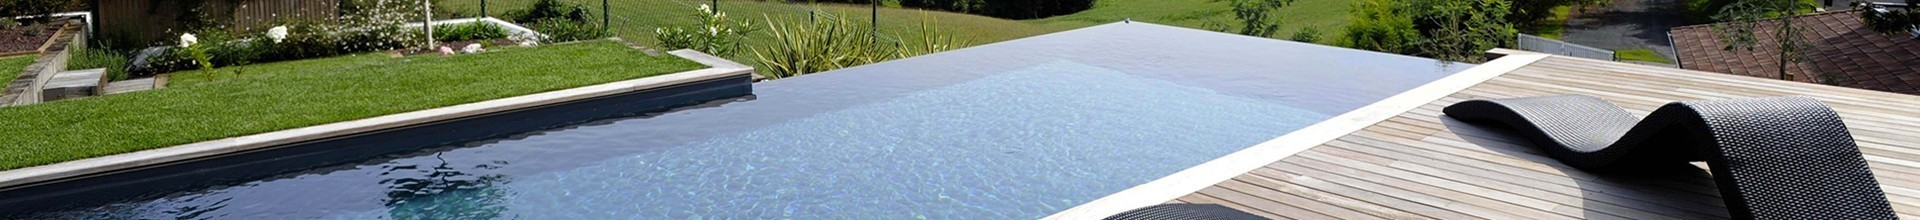 Direct usine, piscine coque prix Gironde